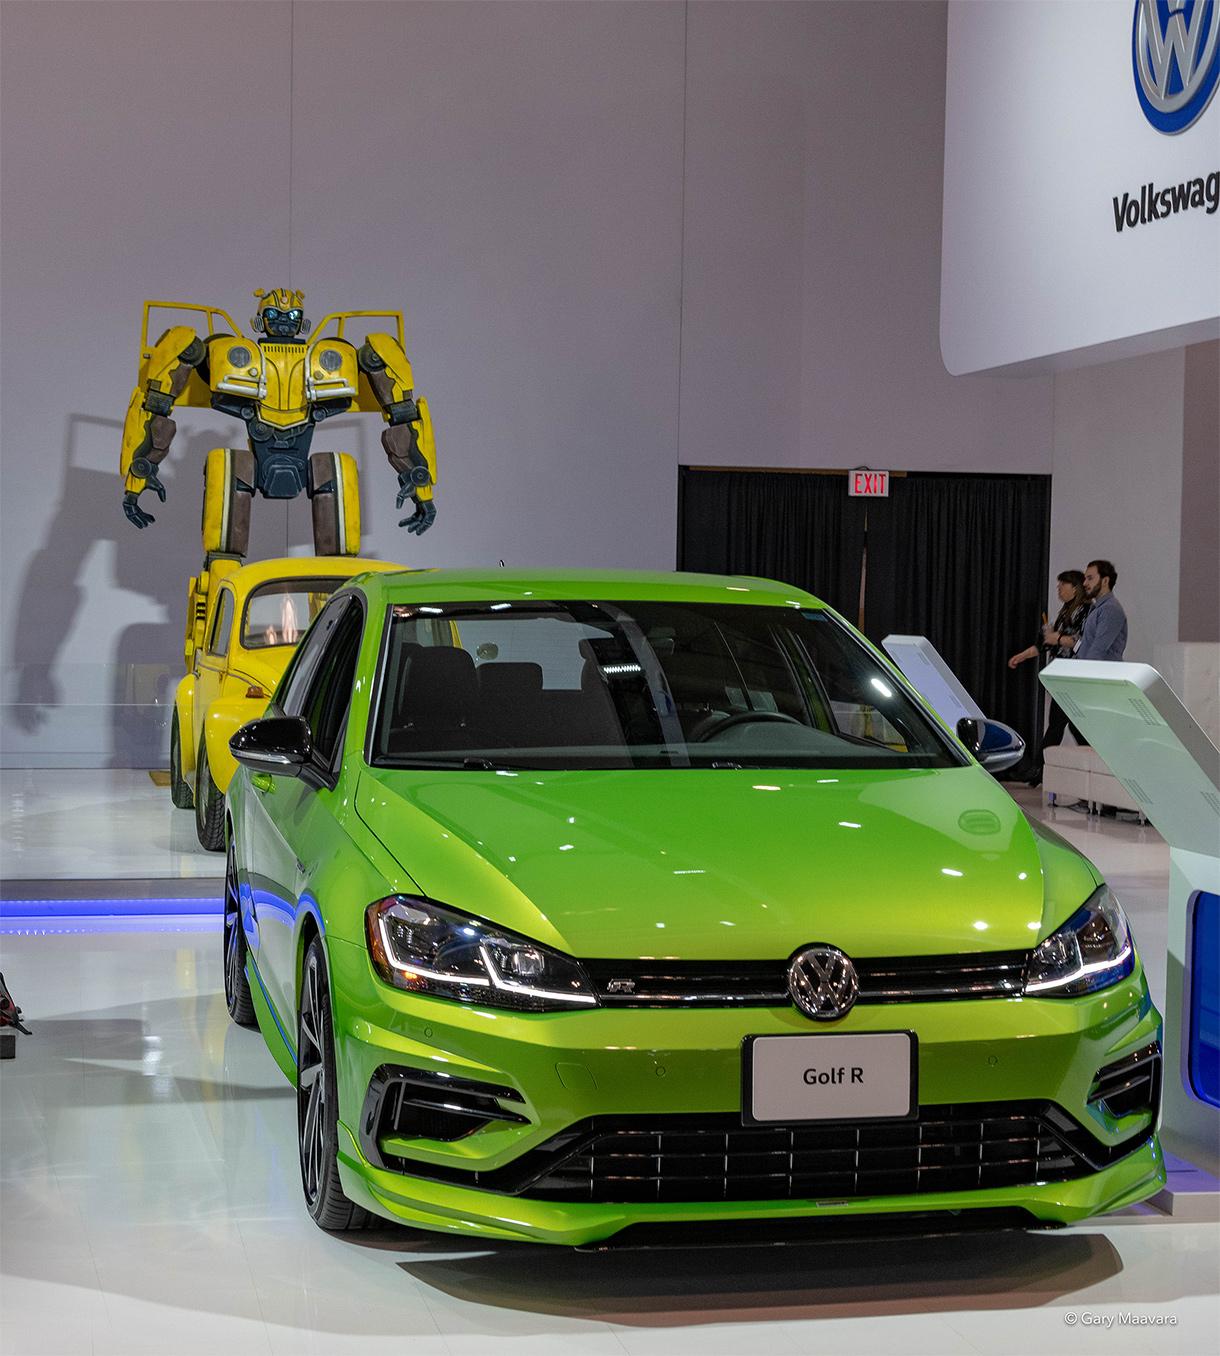 TrackWorthy - CIAS_VW Golf R with Beetle and Transformer